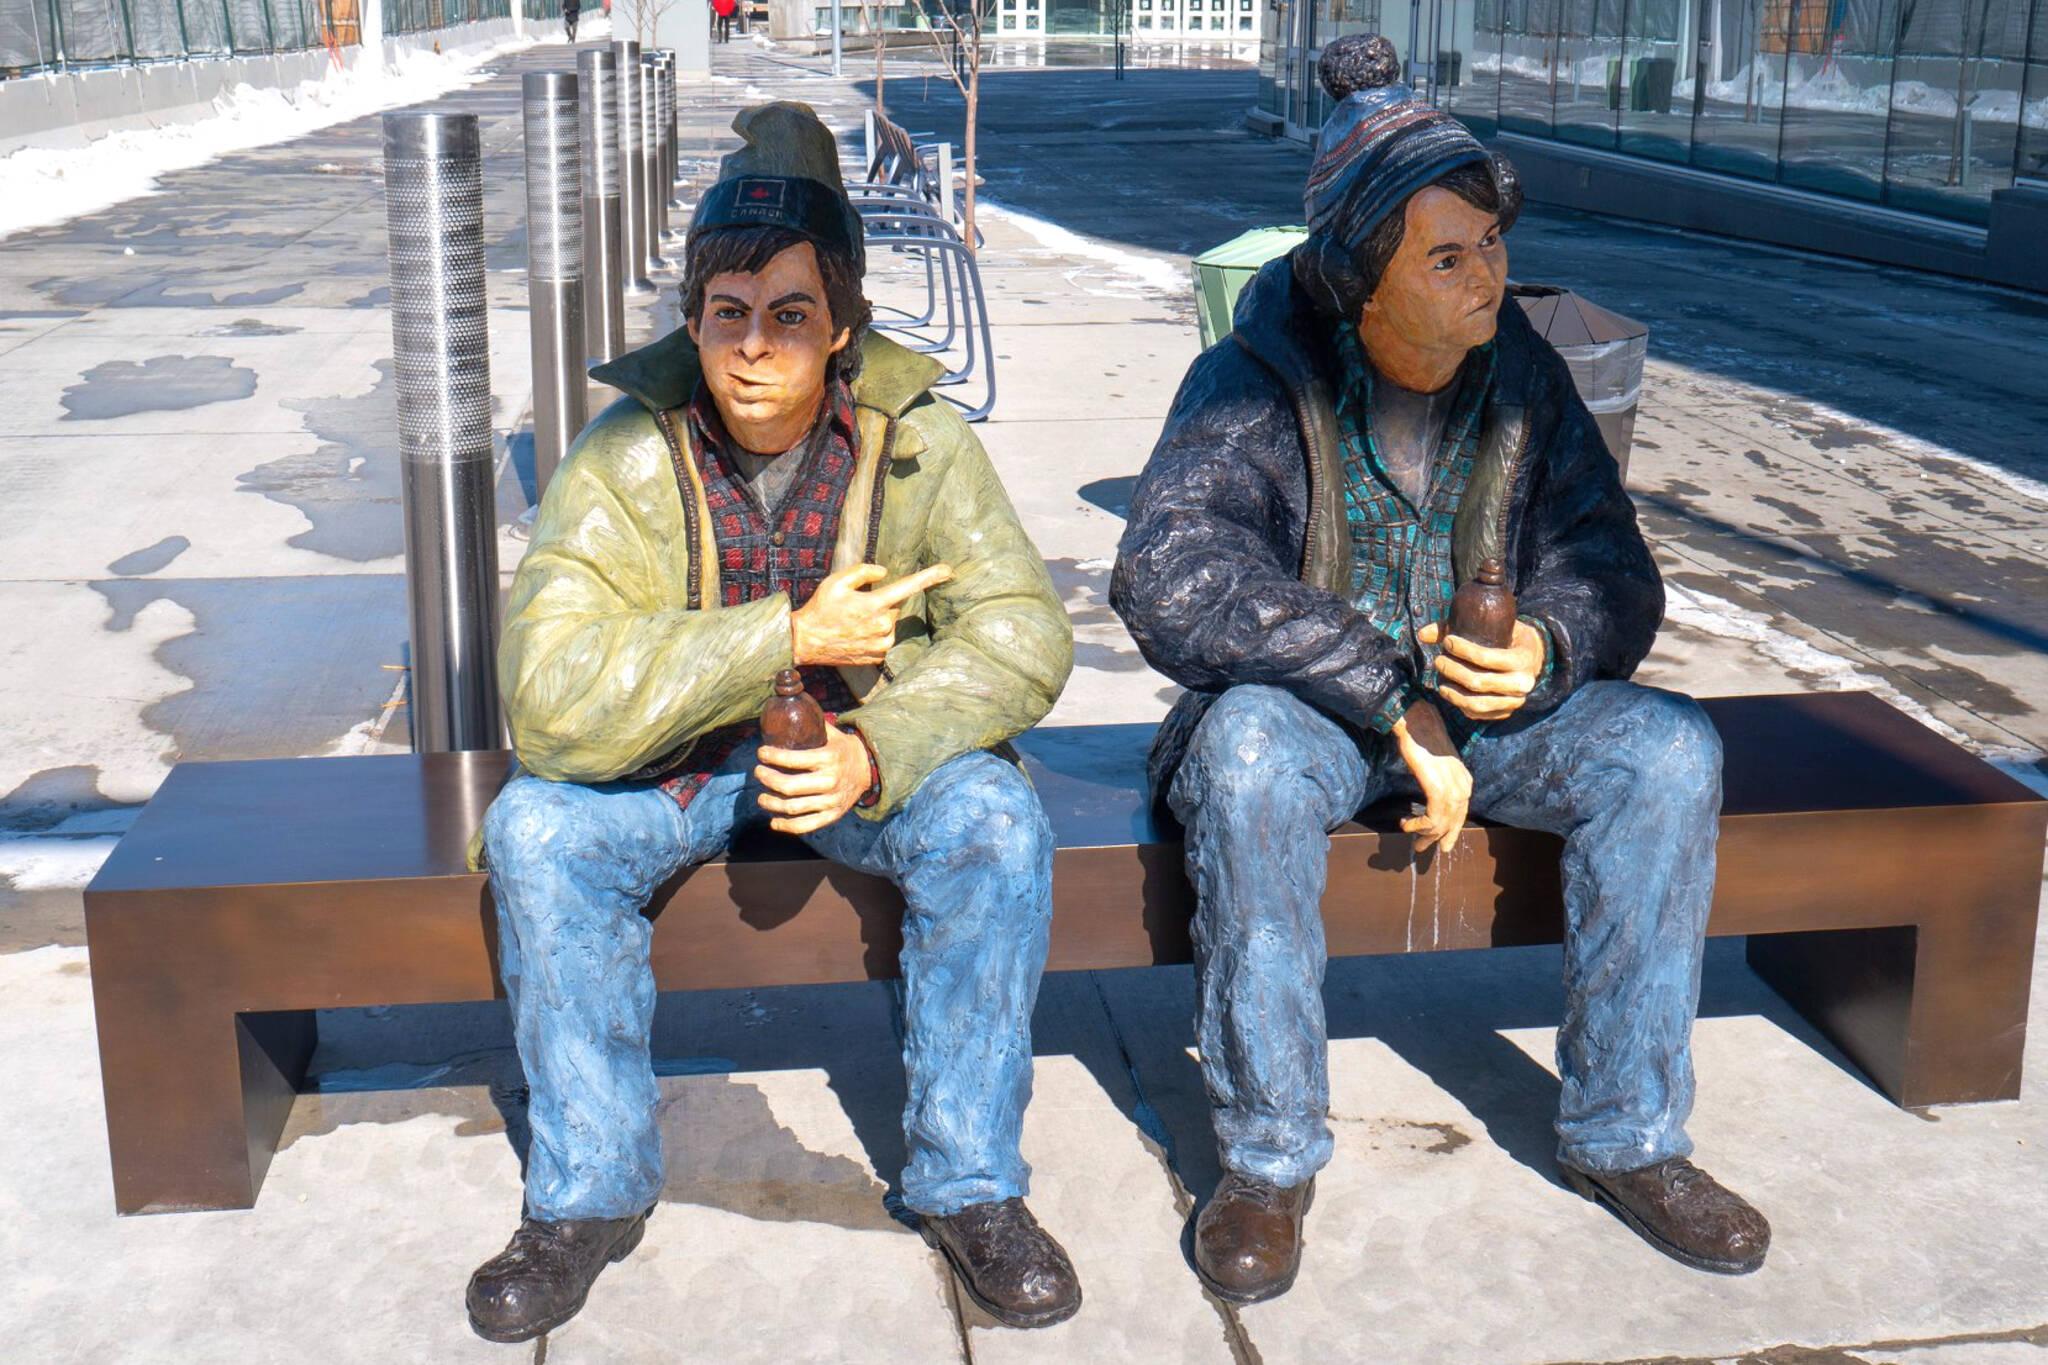 bob and doug mckenzie statue